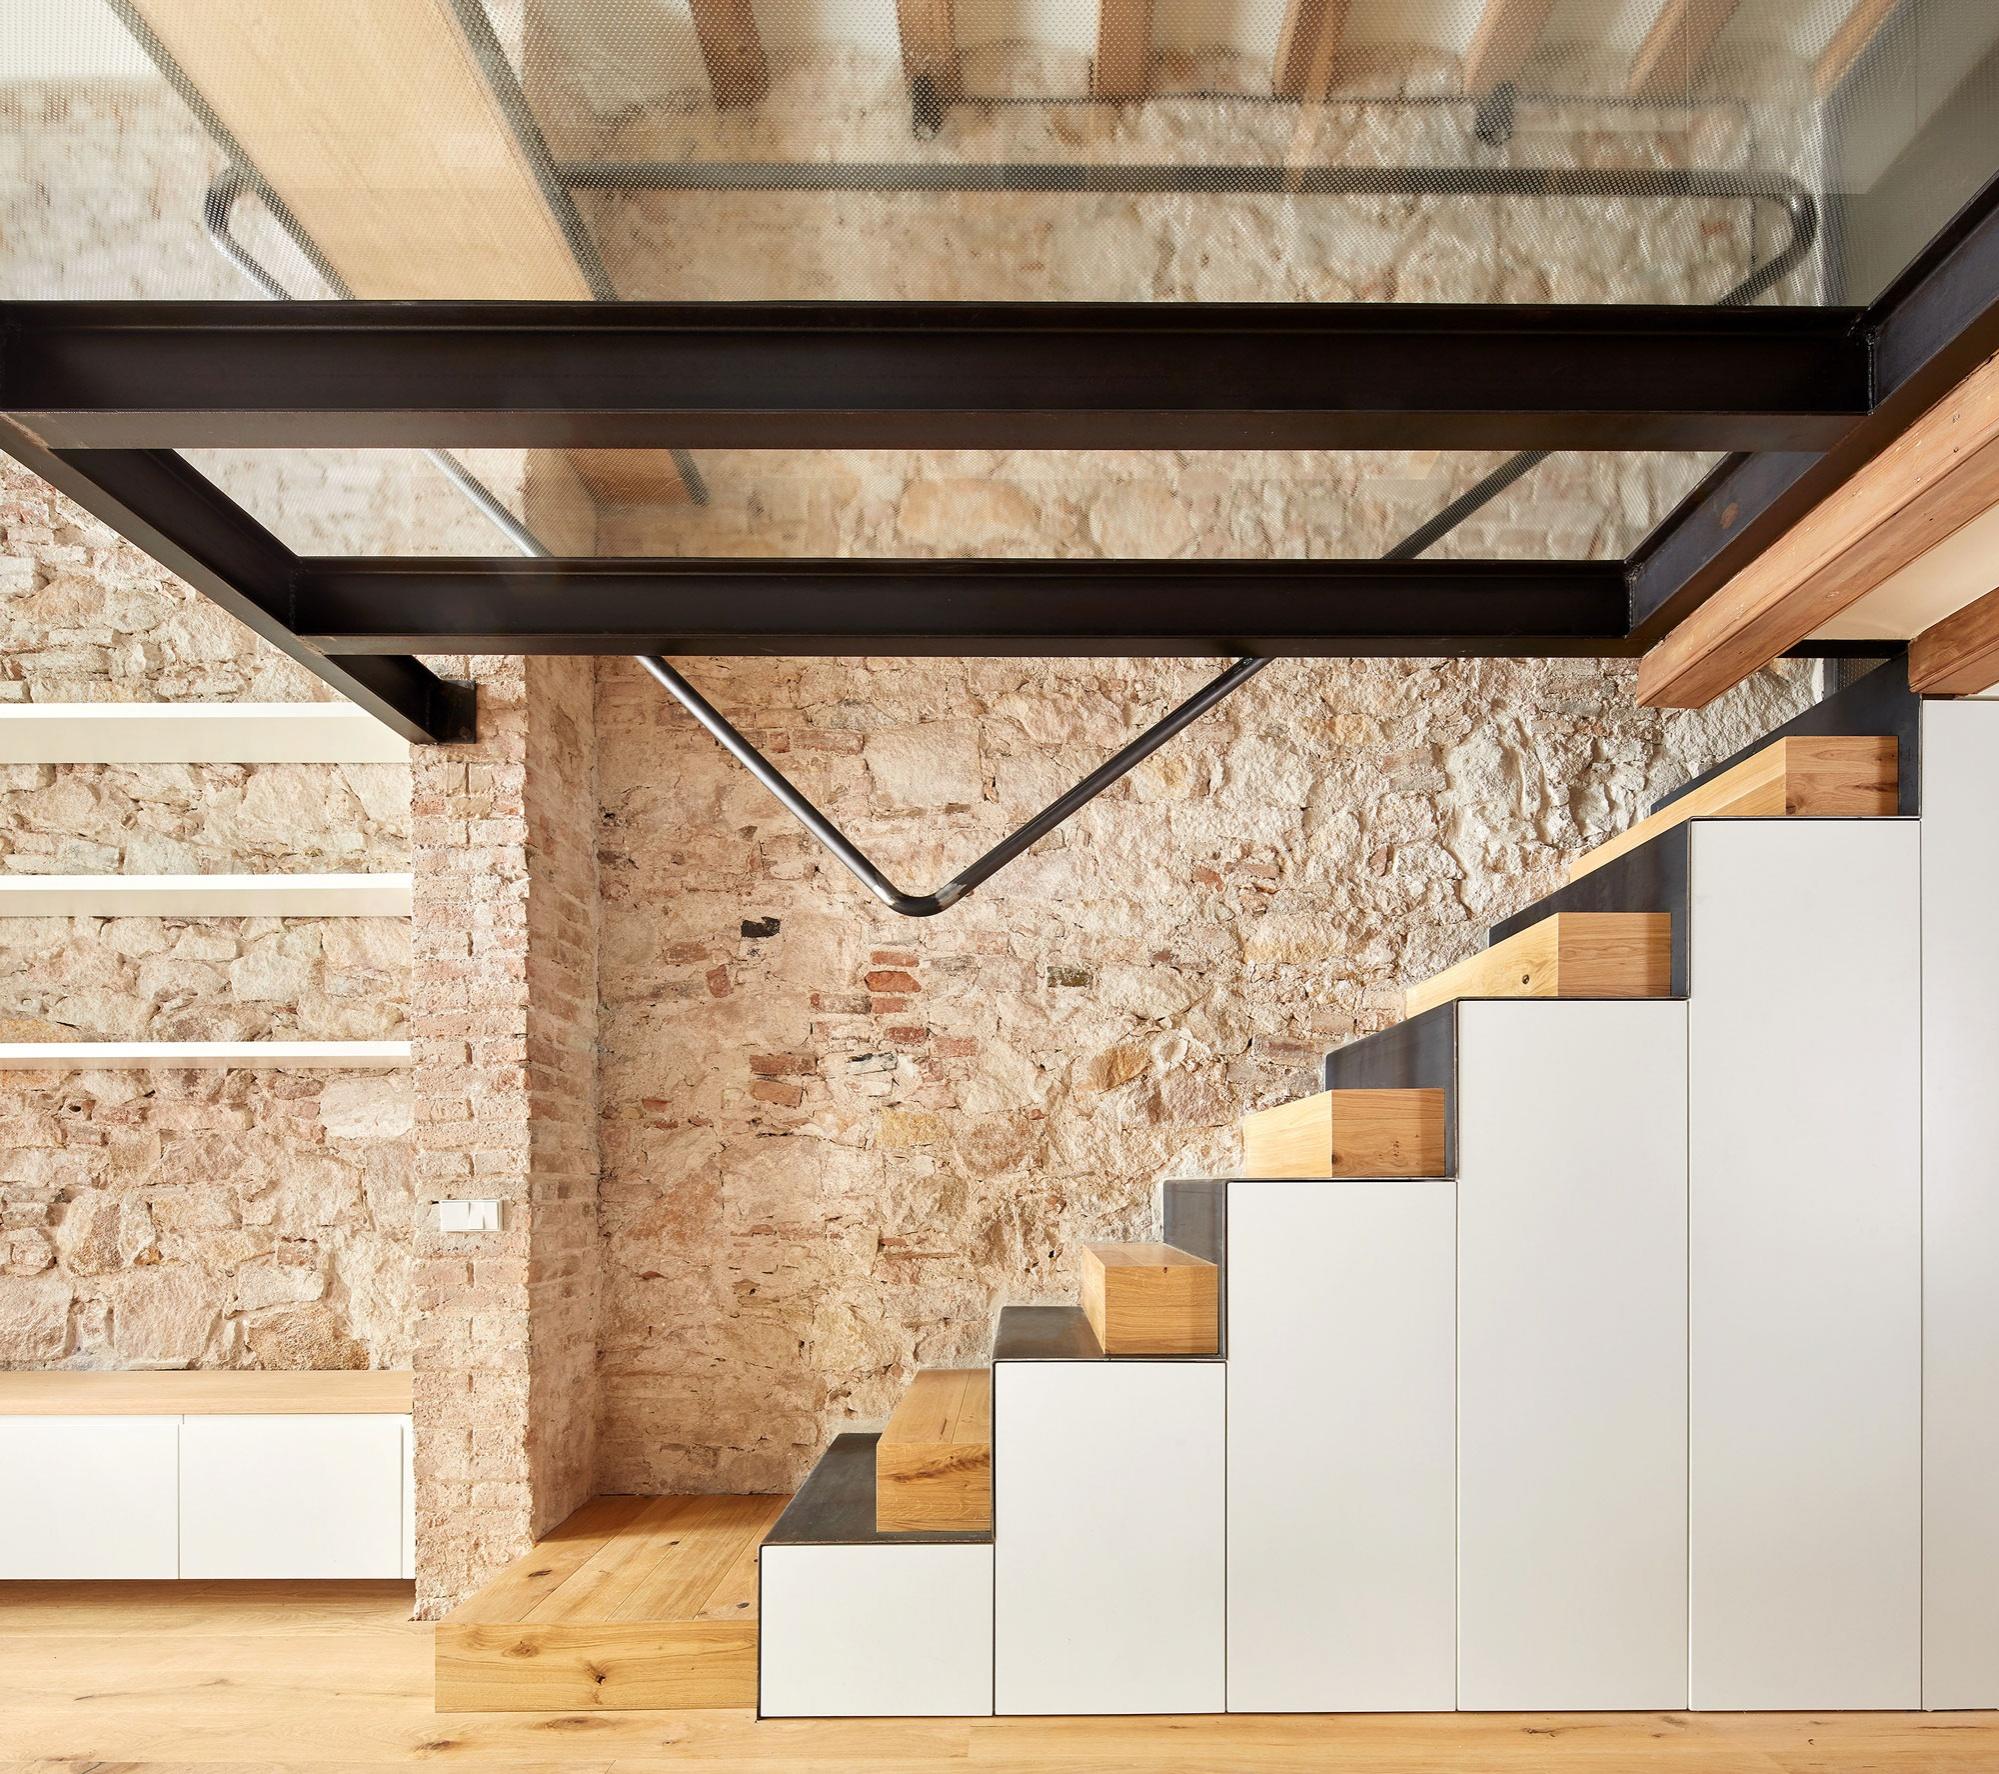 stone-house-renovation-11_01